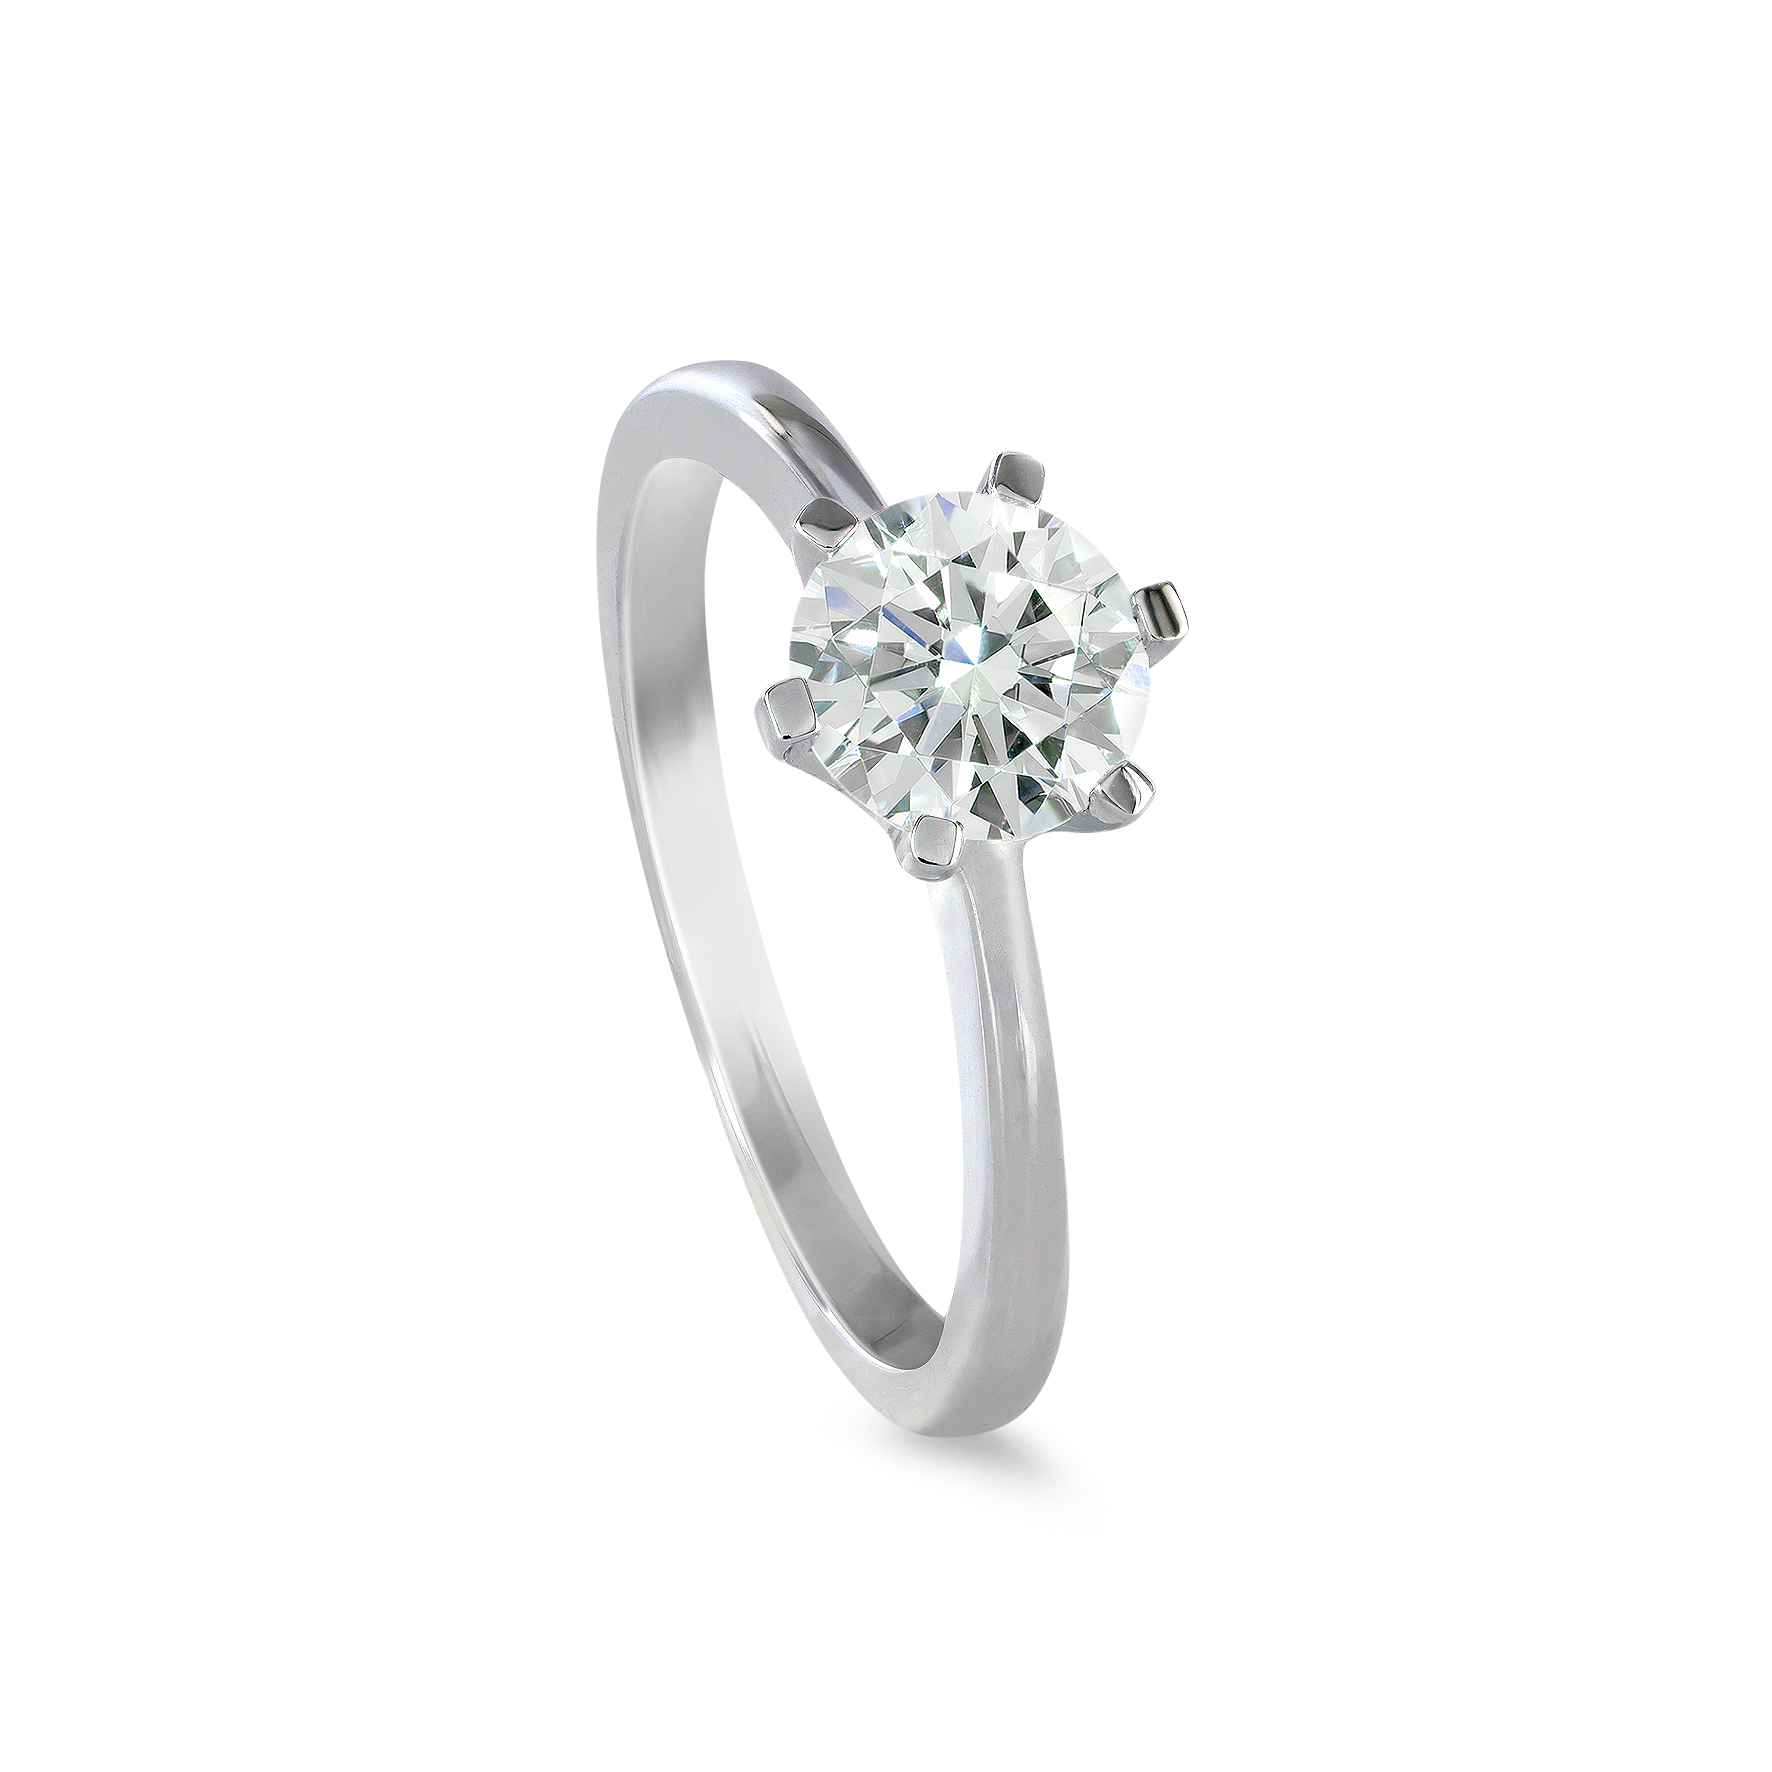 ba61ff7d0975 Кольца с бриллиантами на заказ, купить дорогое кольцо с крупным бриллиантом